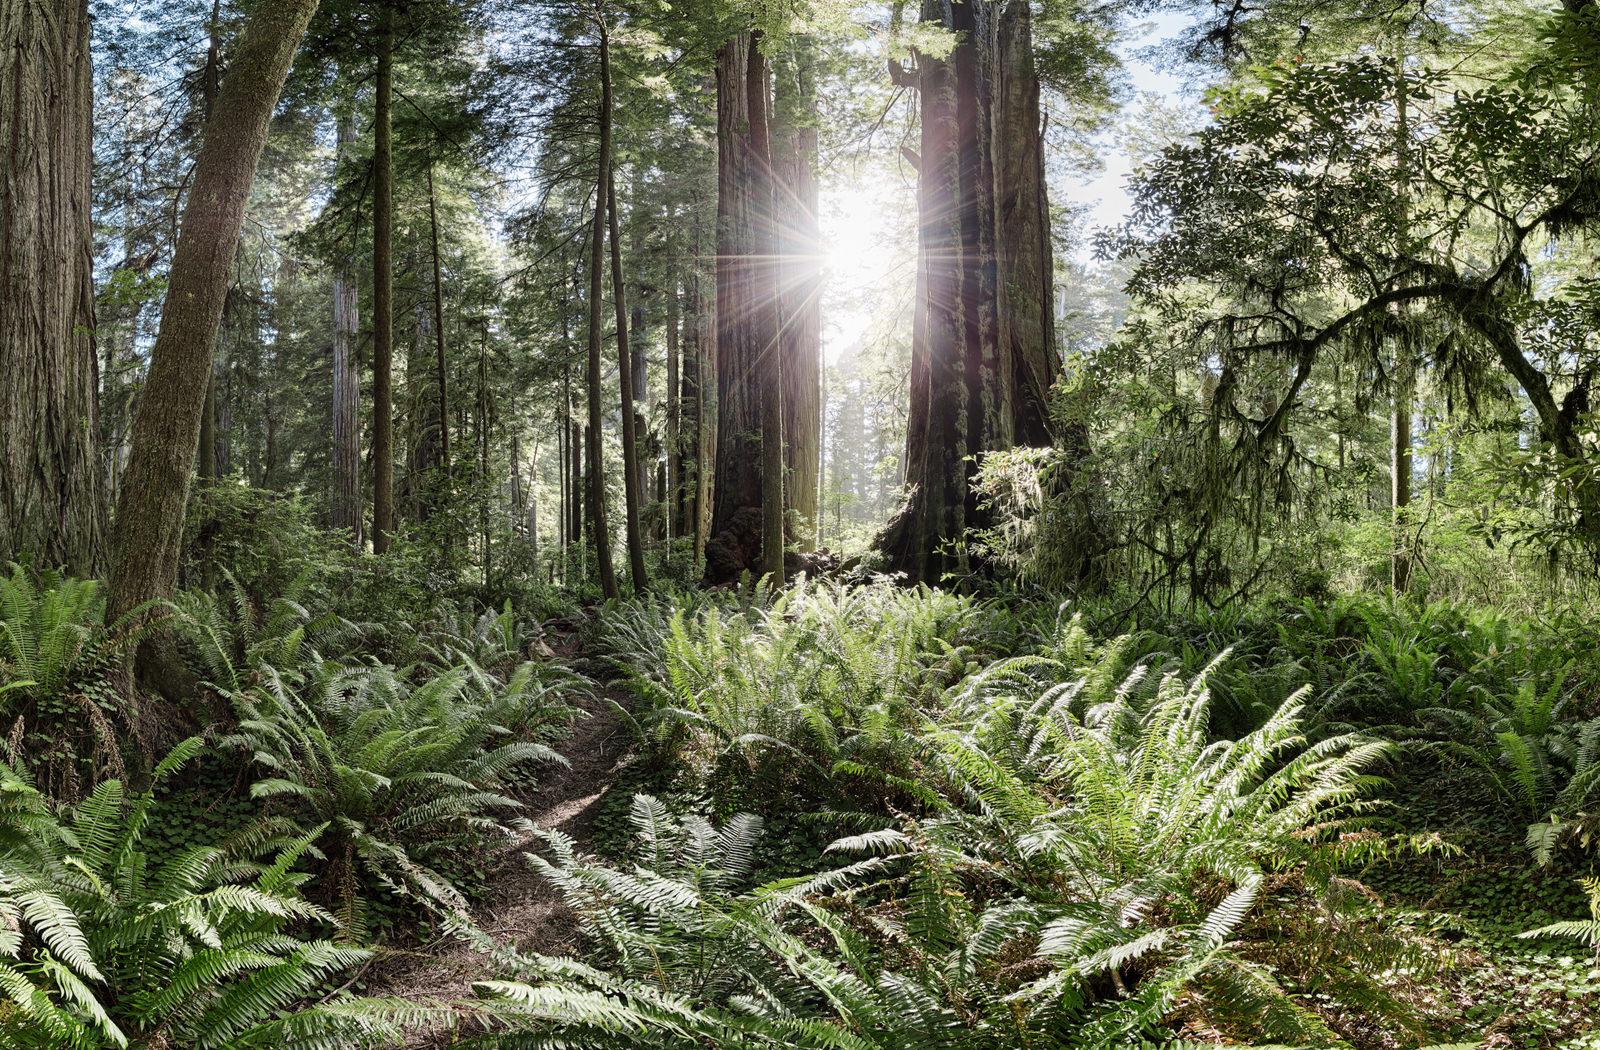 Humboldt Redwoods State Park 360